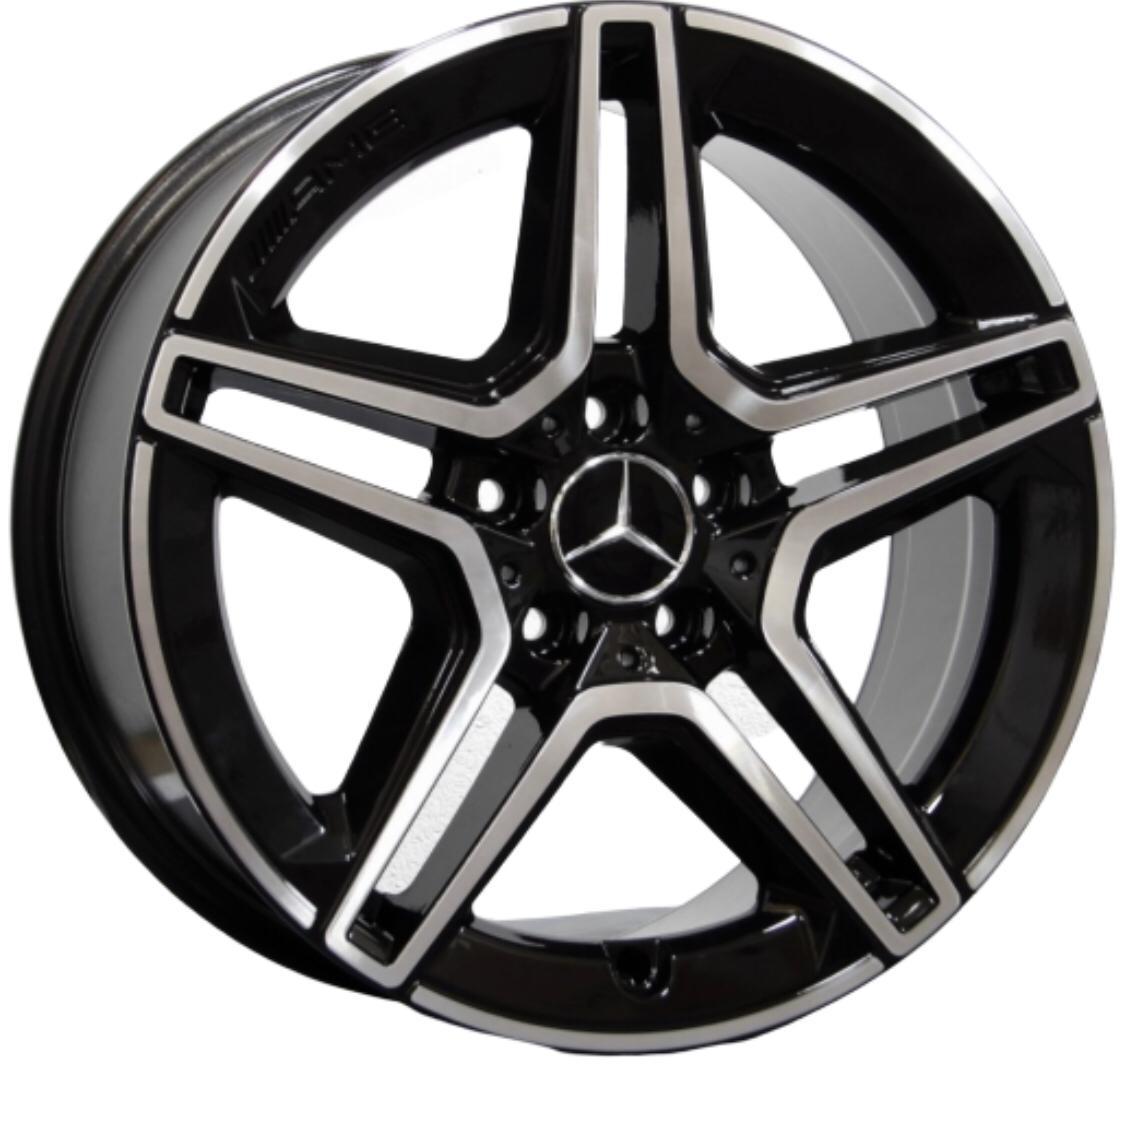 Kit 4 Rodas Aro 18x8/8,5 Raw Mercedes C300 5X112 BD C37 Duas Talas